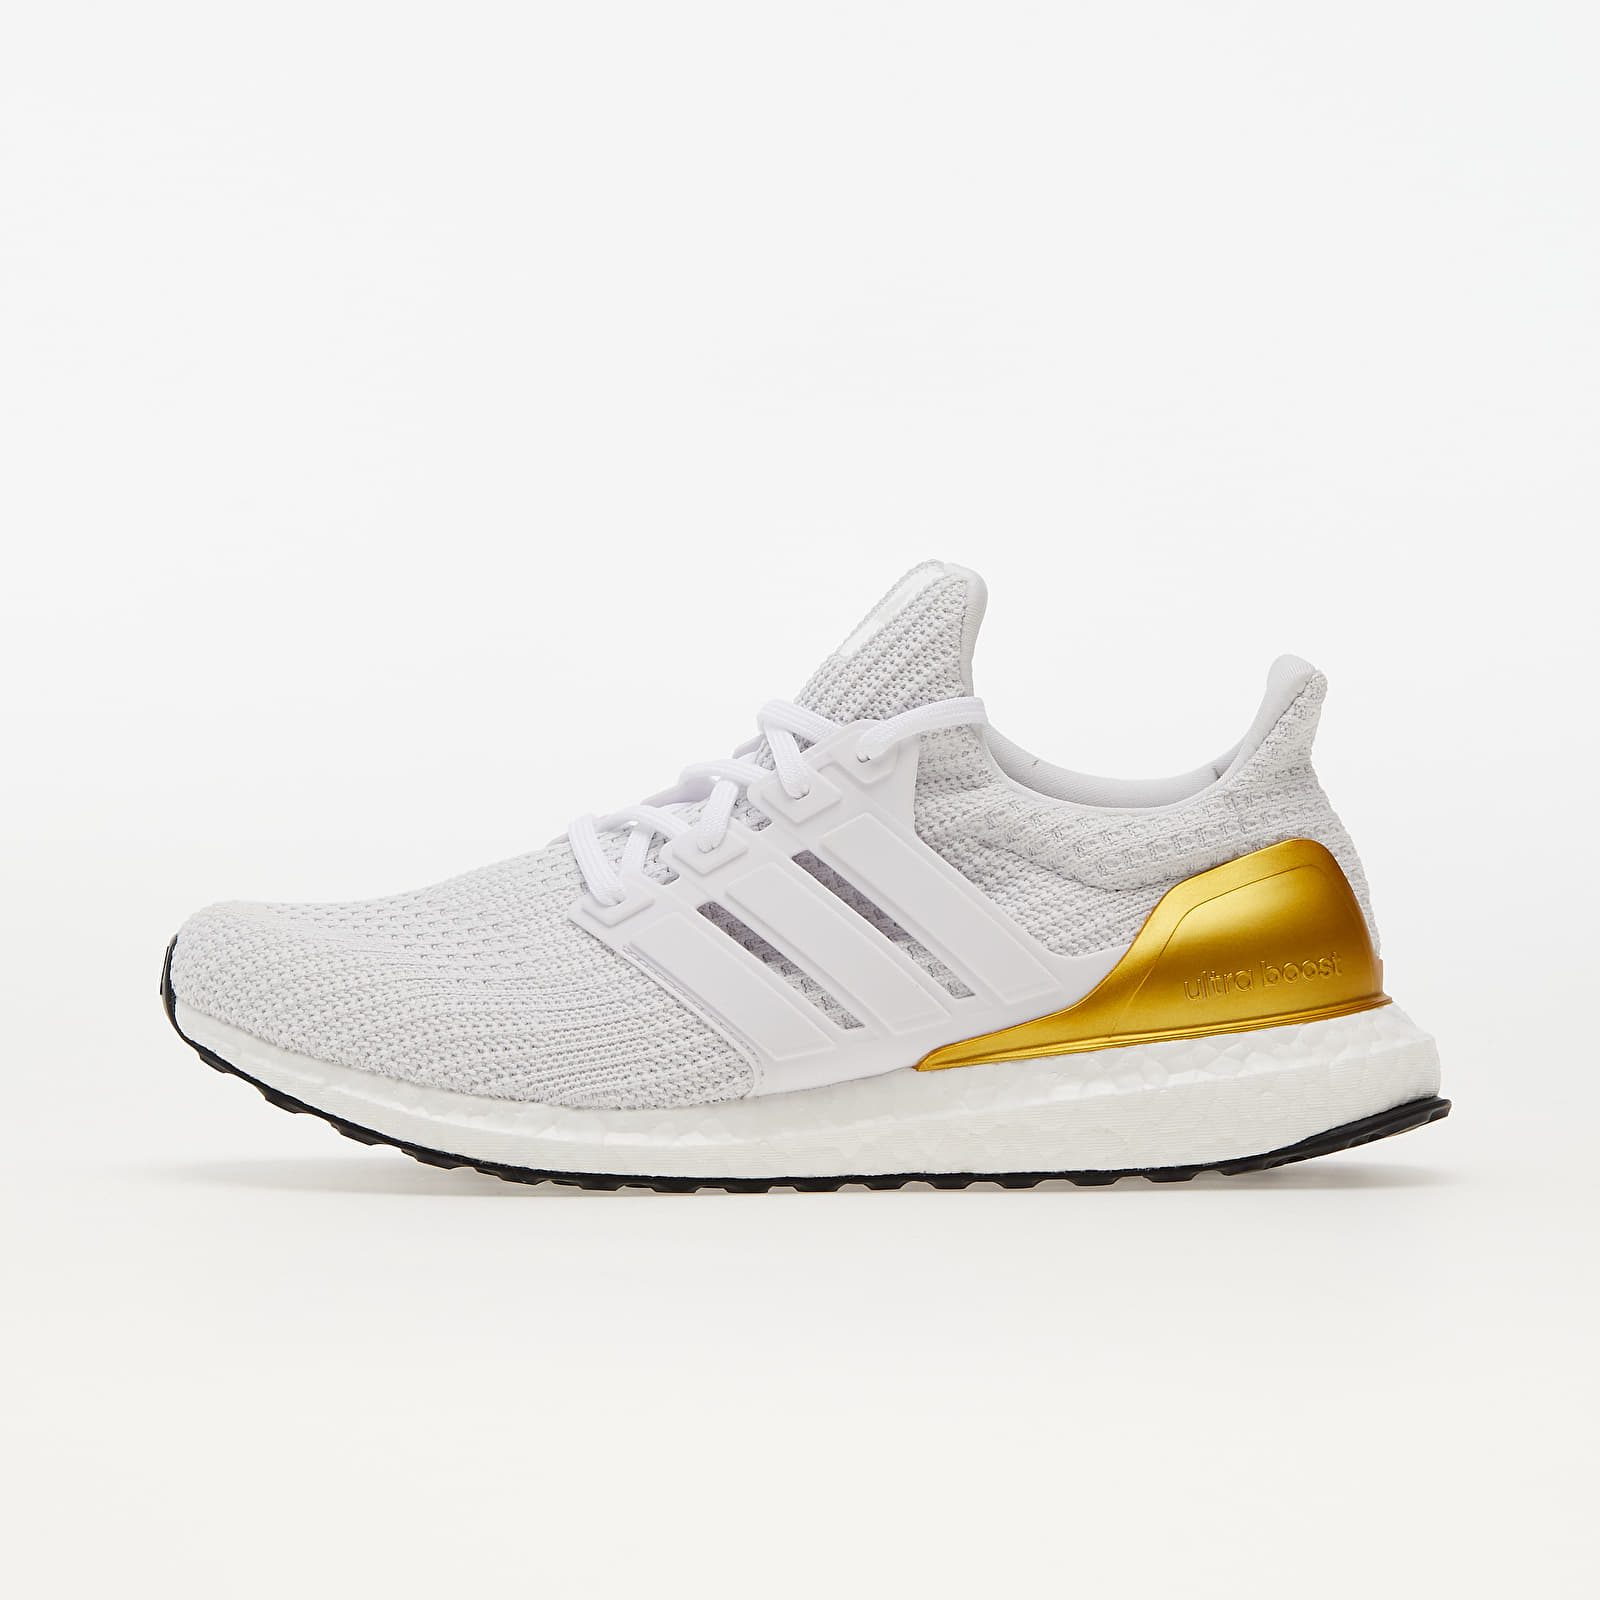 adidas UltraBOOST 4.0 DNA Ftw White/ Ftw White/ Gold Metallic EUR 44 2/3